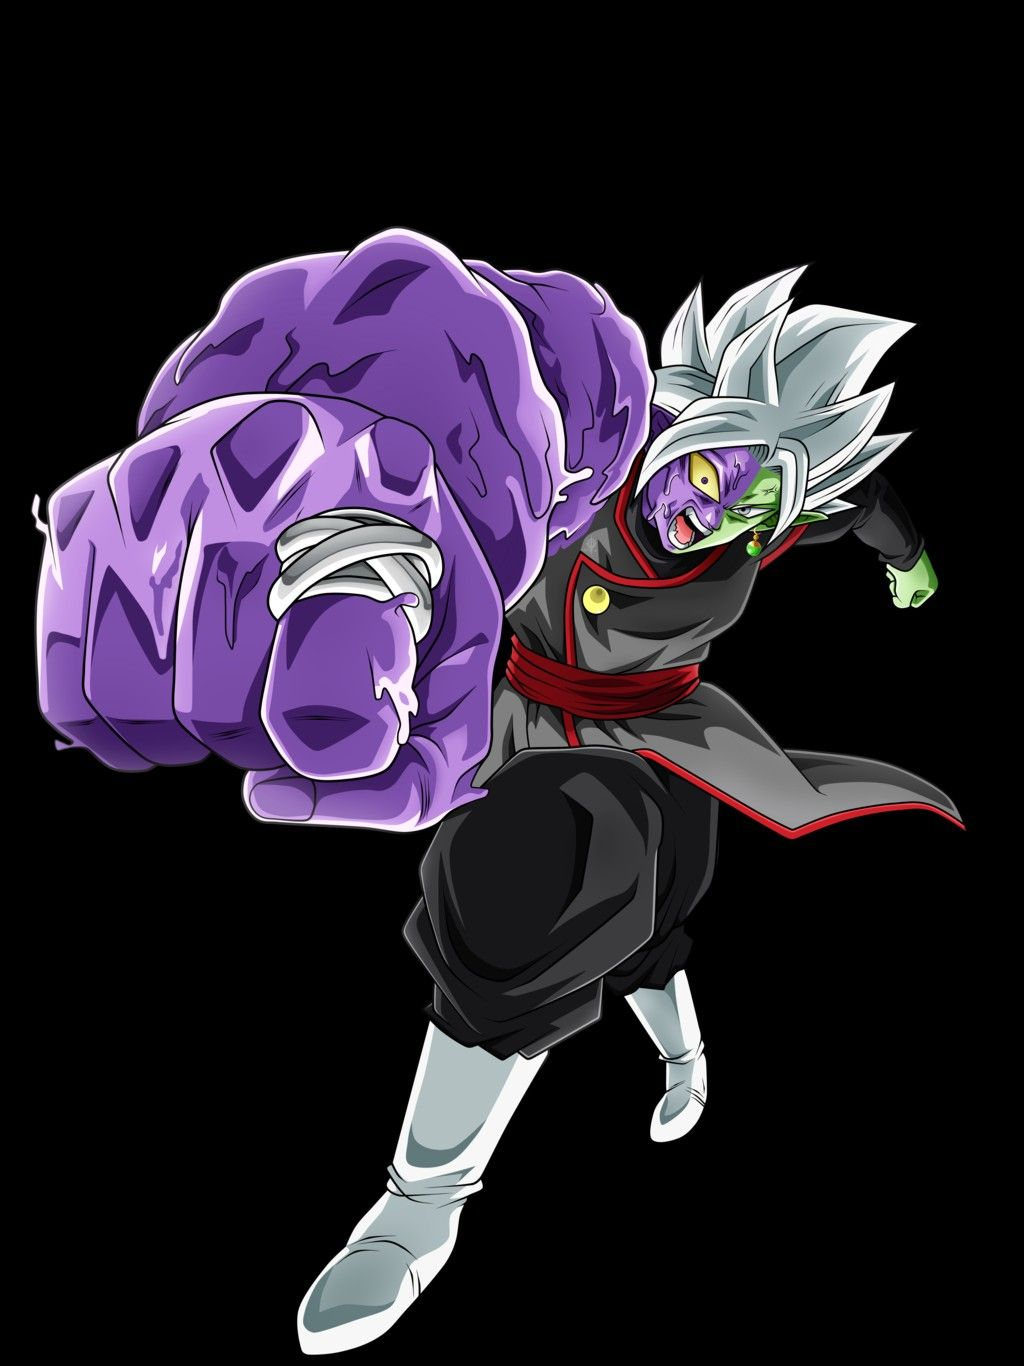 fusion zamasu half corrupted dragon ball franchsie fanart